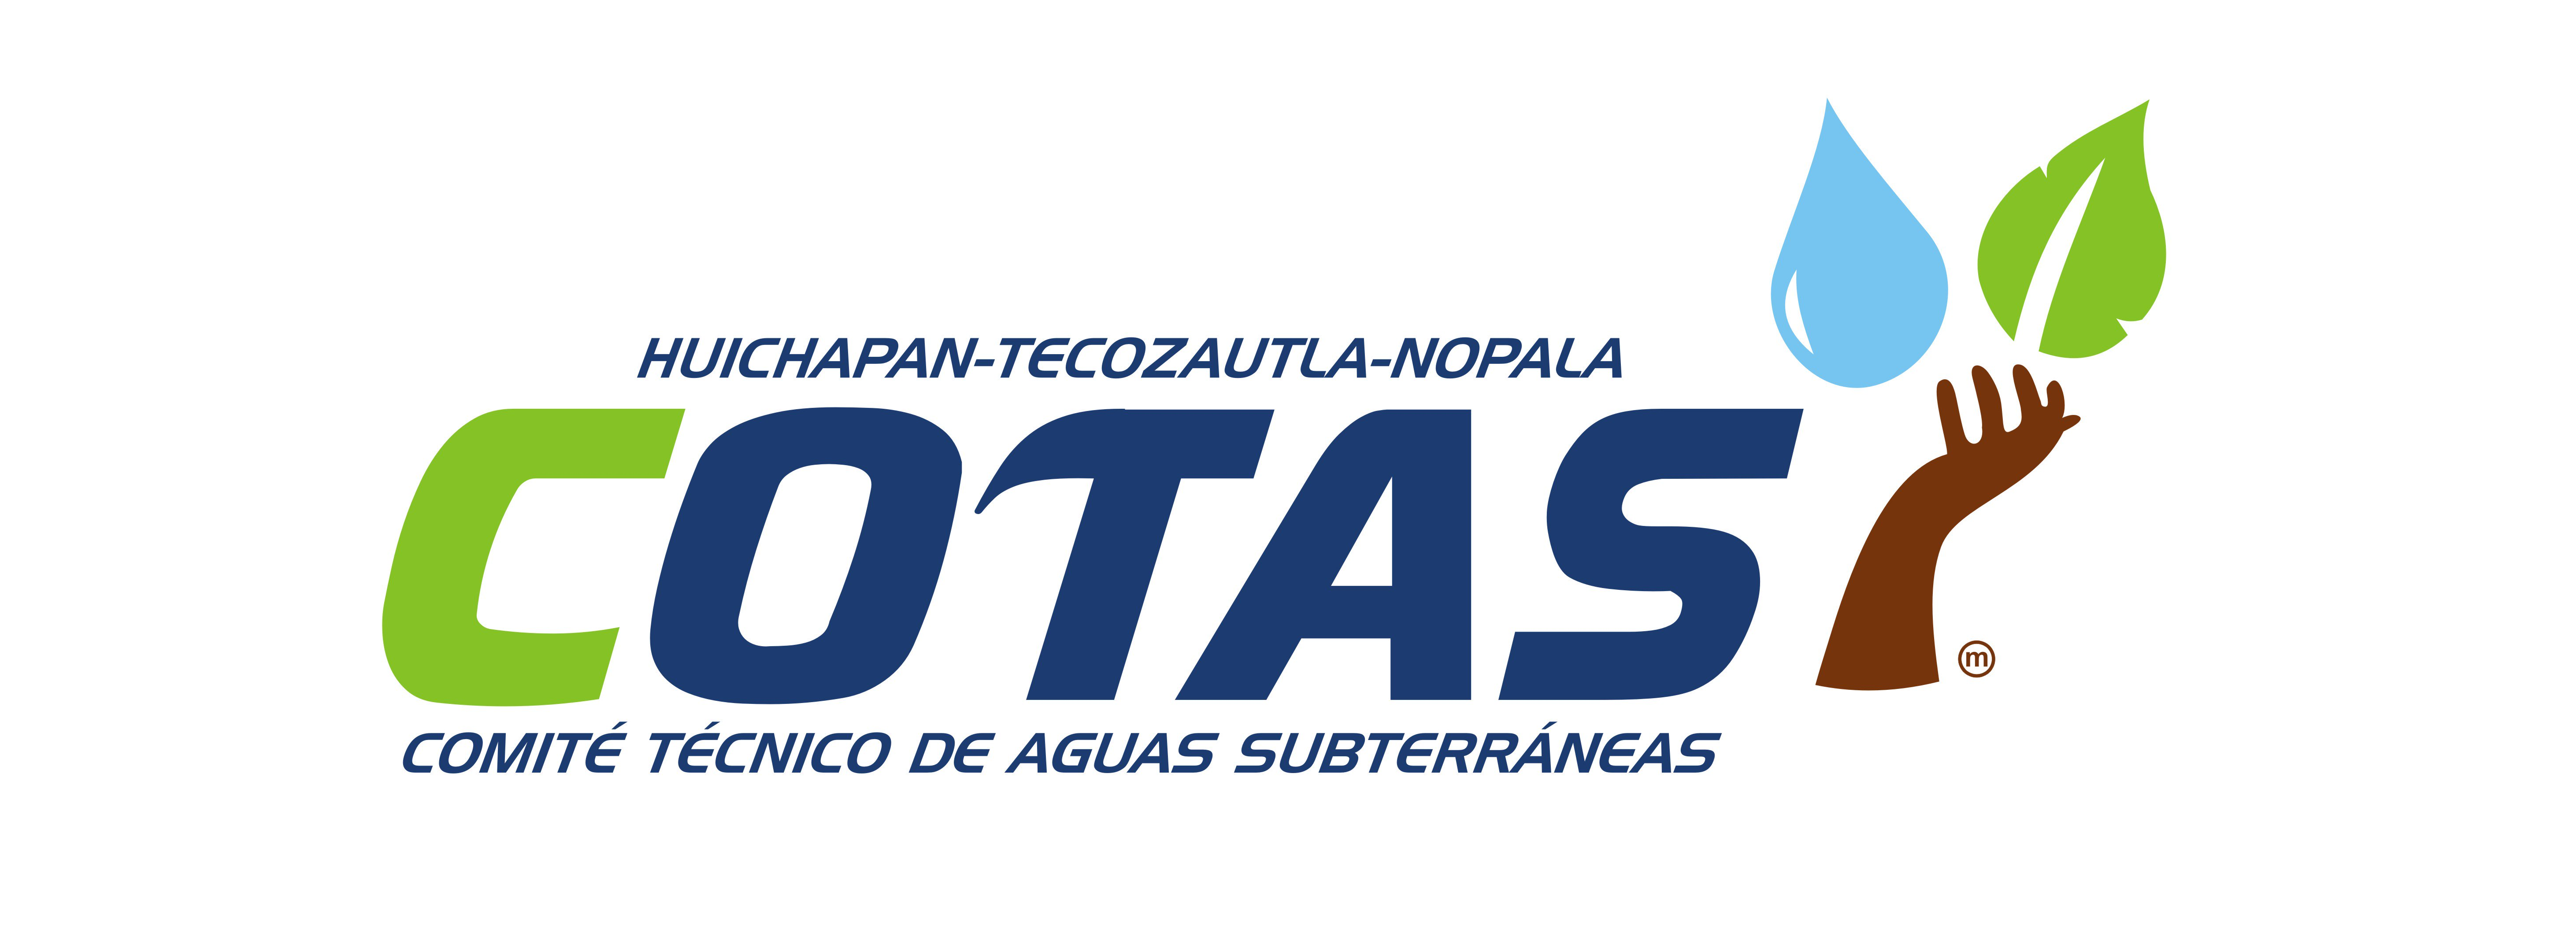 Cotas Huichapan Tecozautla Nopala